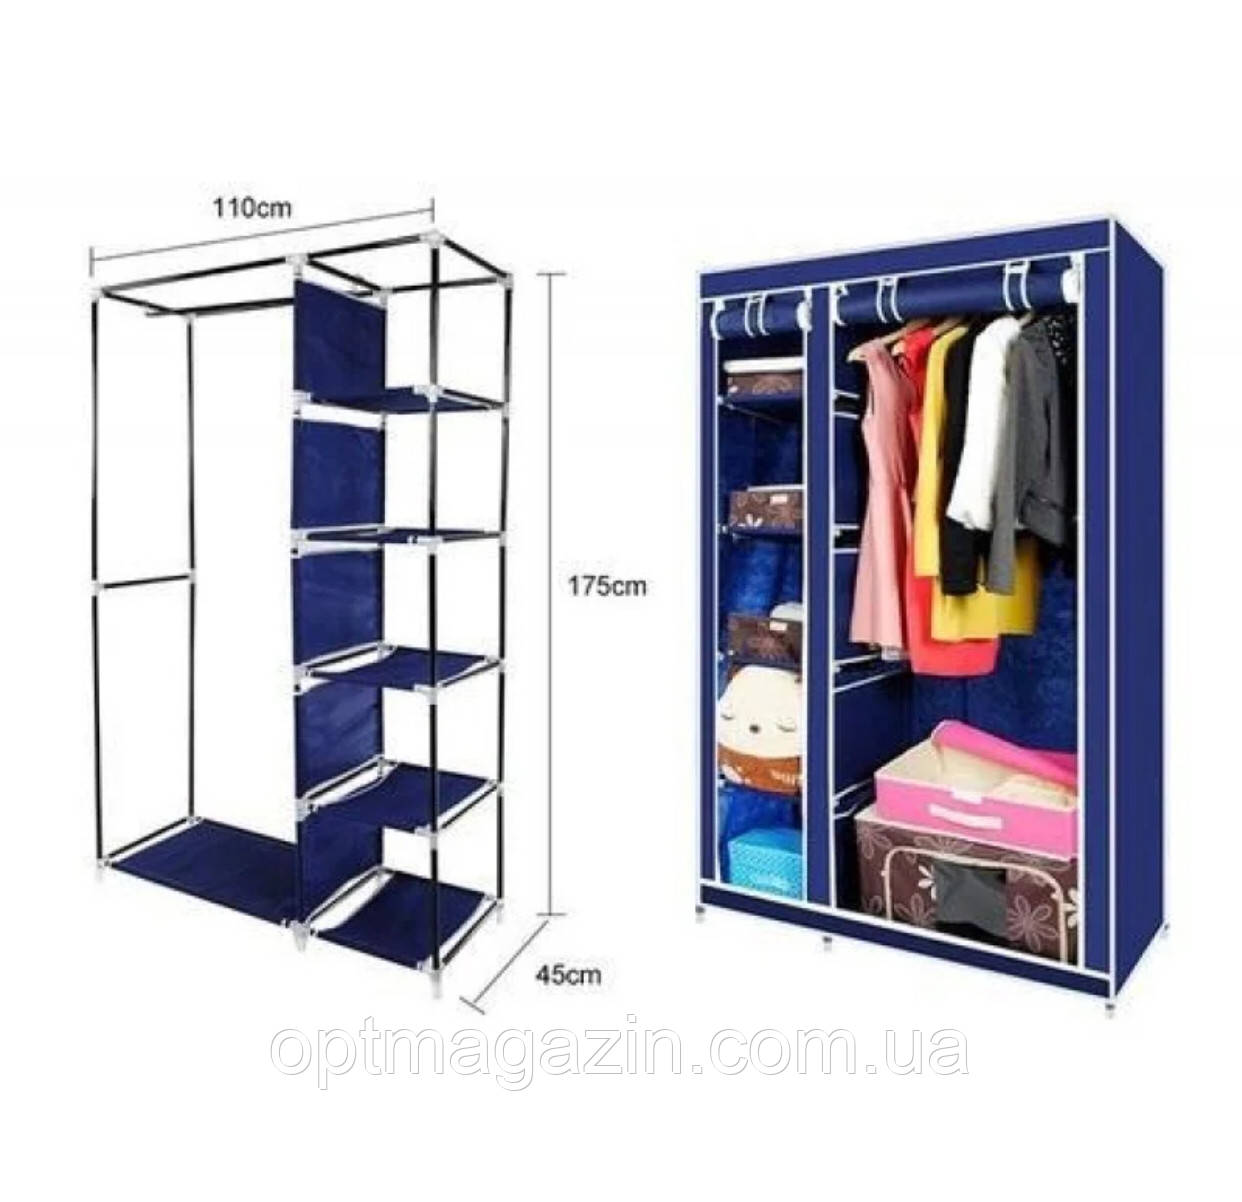 Тканинній шафа для одягу Clothes Rail With Protective Cover №28109 B-156